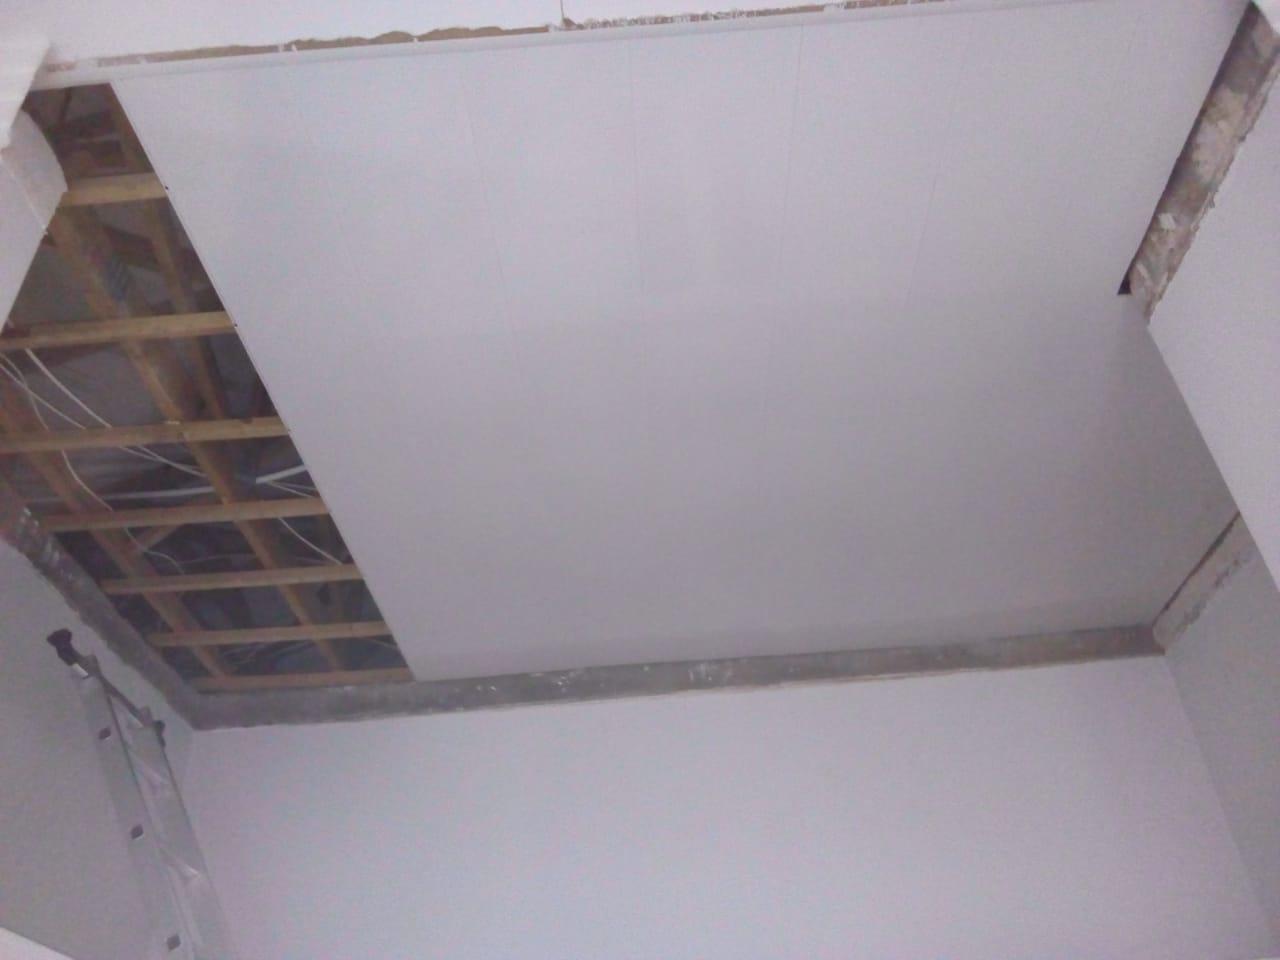 Cuthbert Zodzi maintenance and construction services